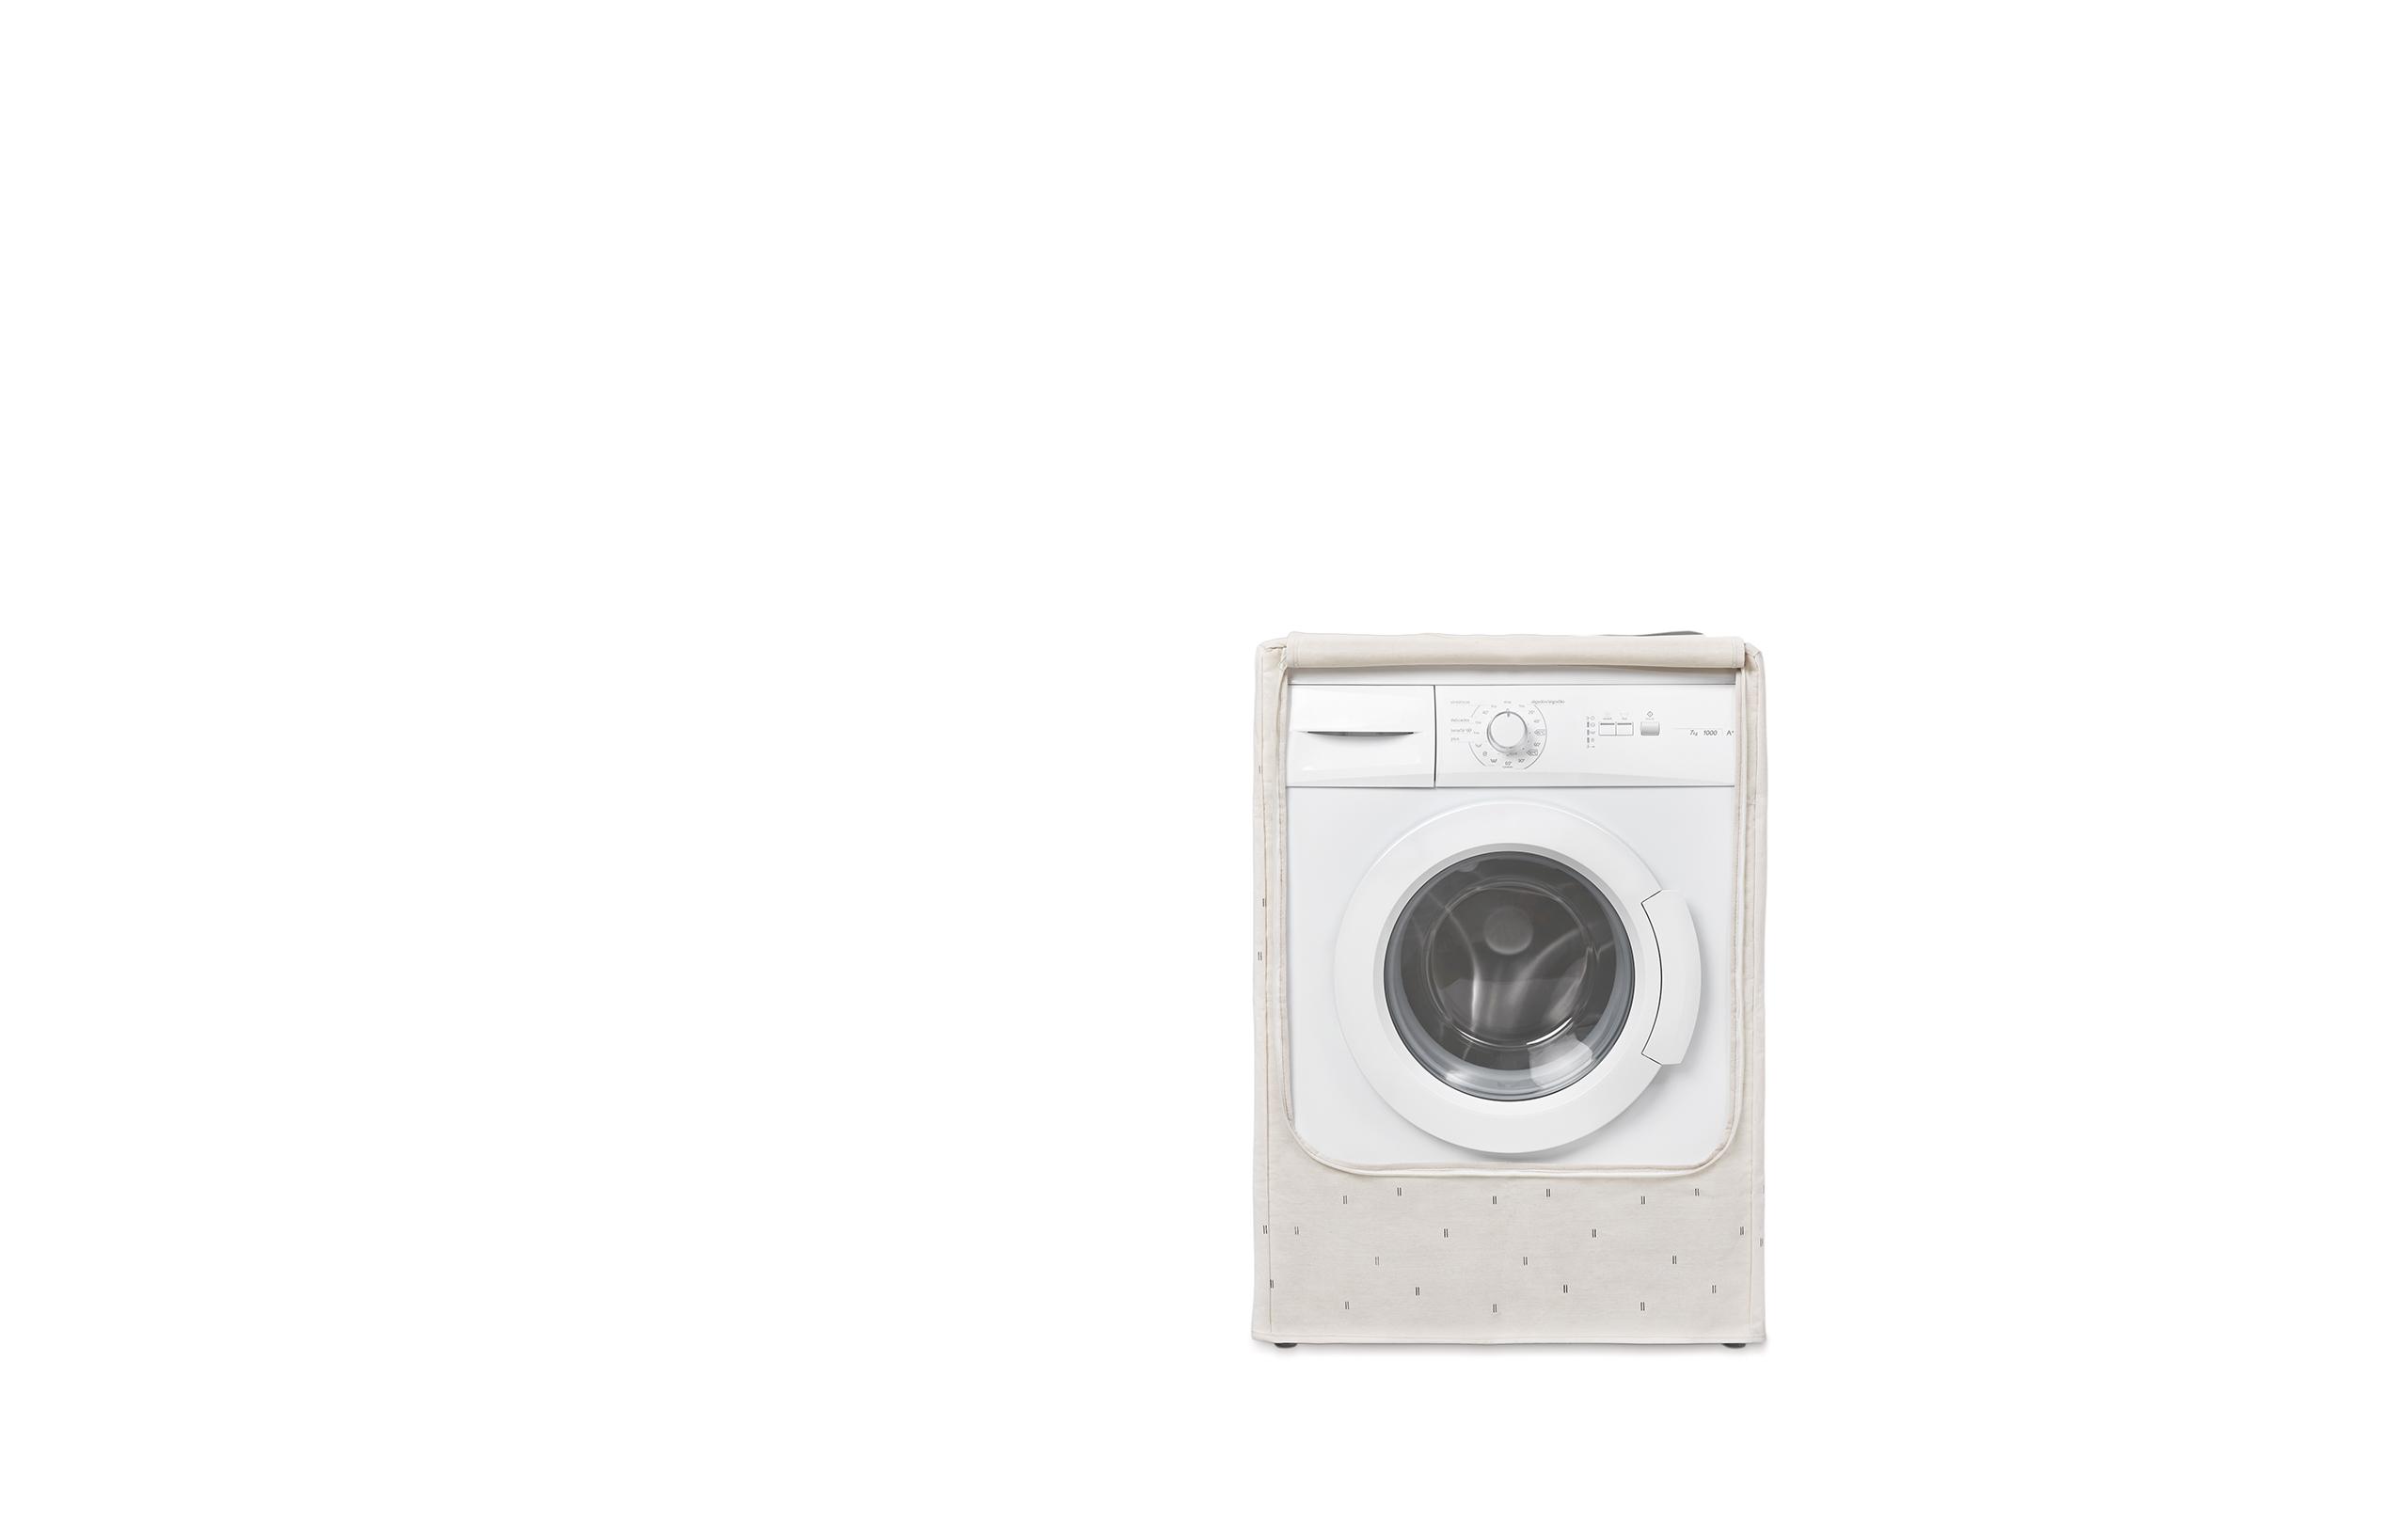 Rayen_Banner_Fundas-lavadora_01_Def Rayen_Banner_Fundas lavadora_01_Def | Rayen.com